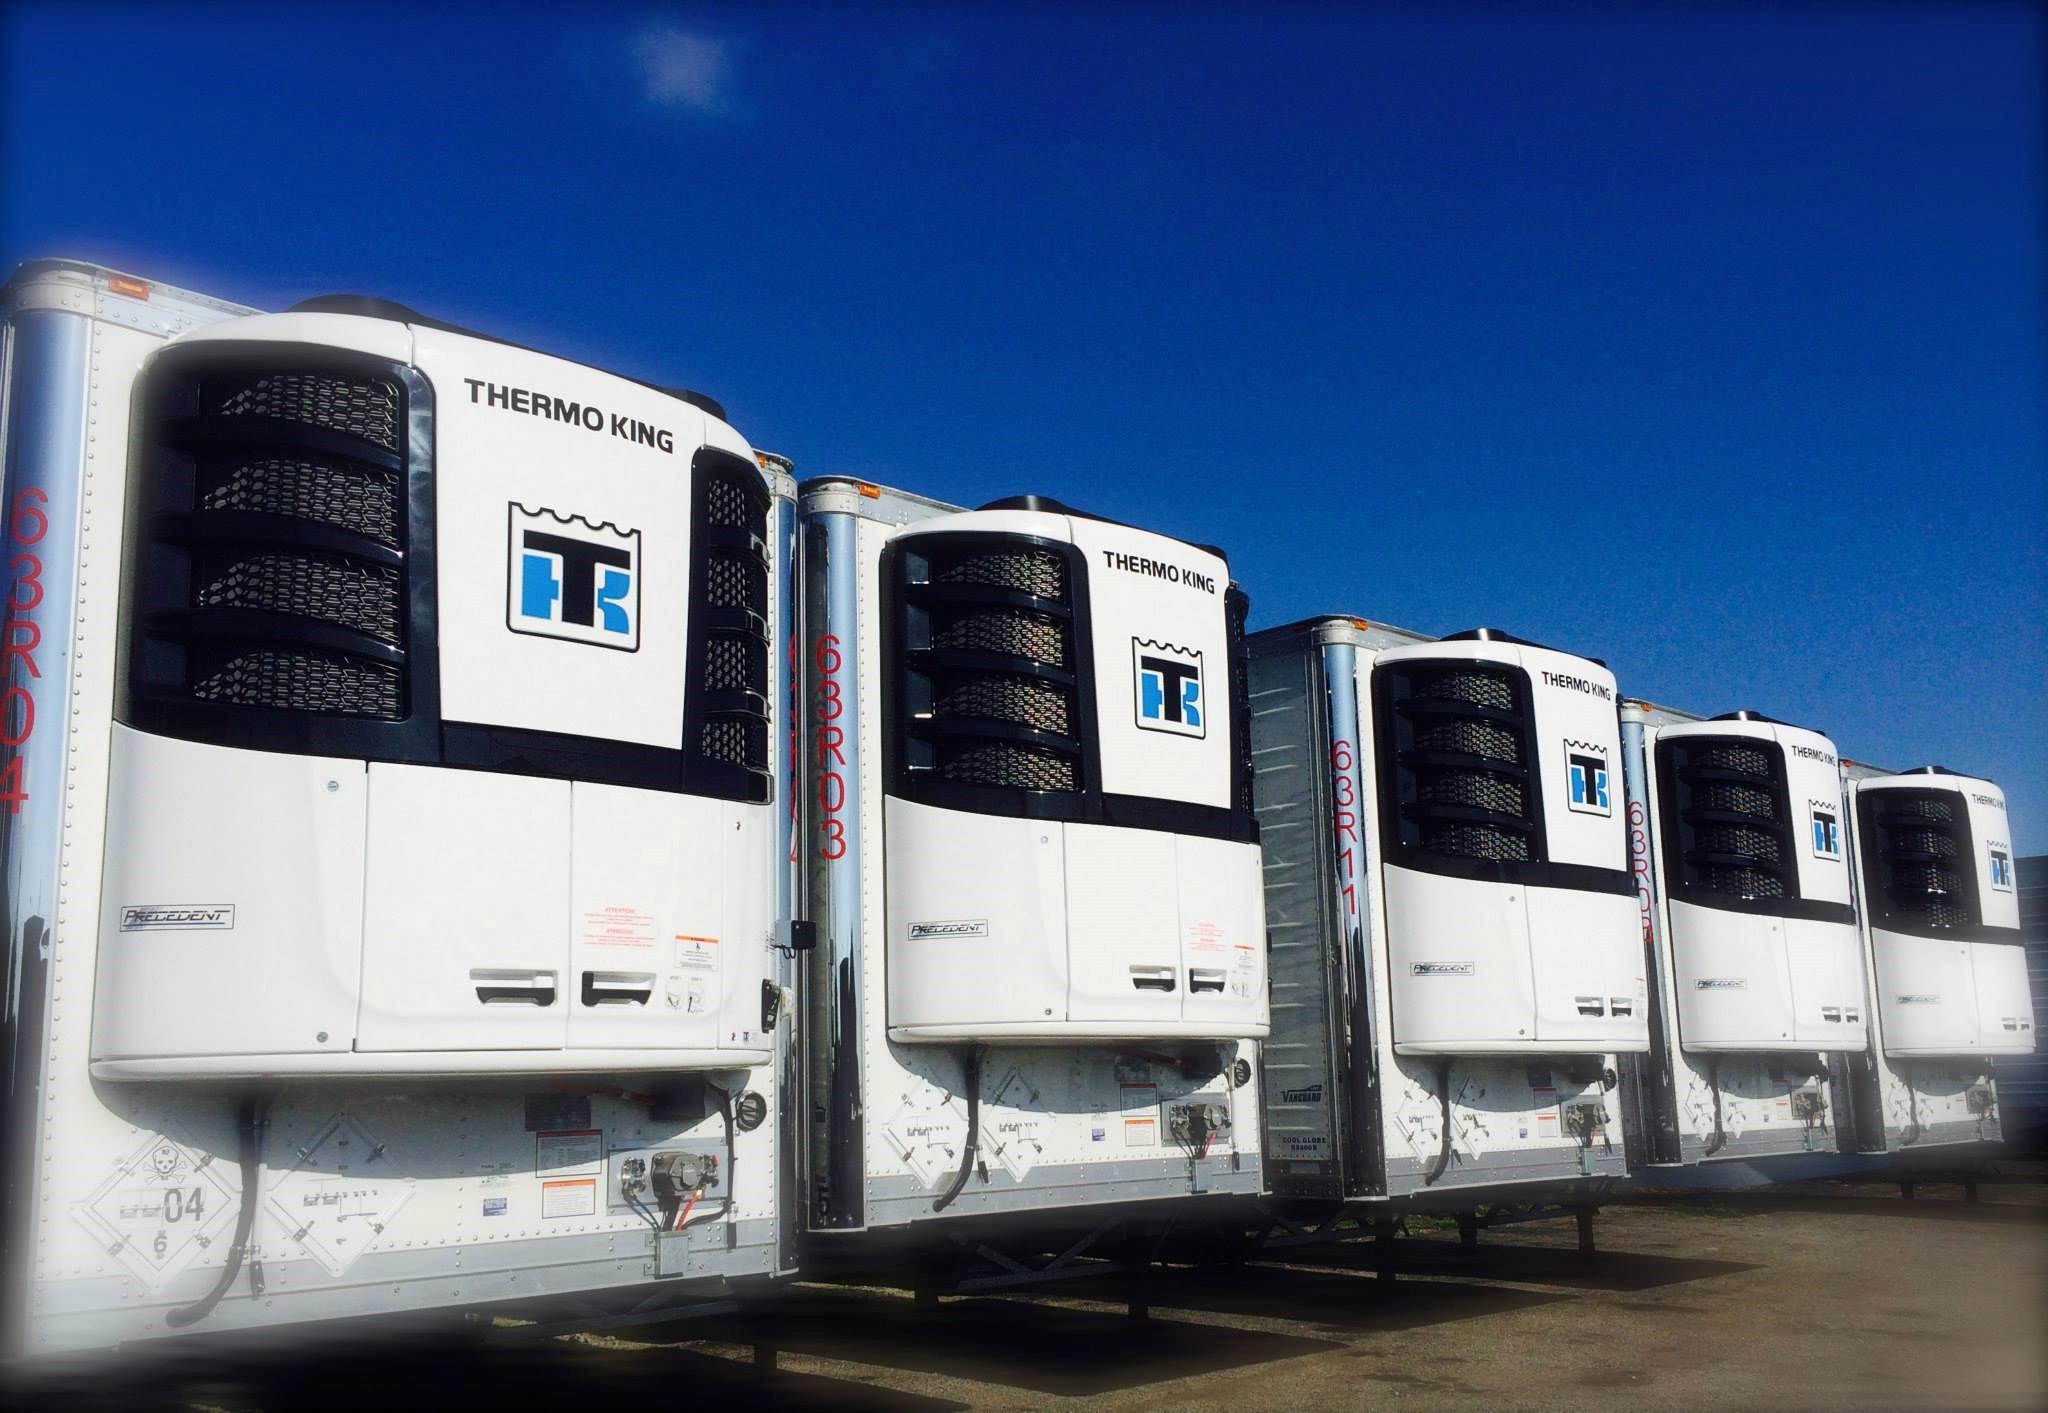 Thermo King Trucks